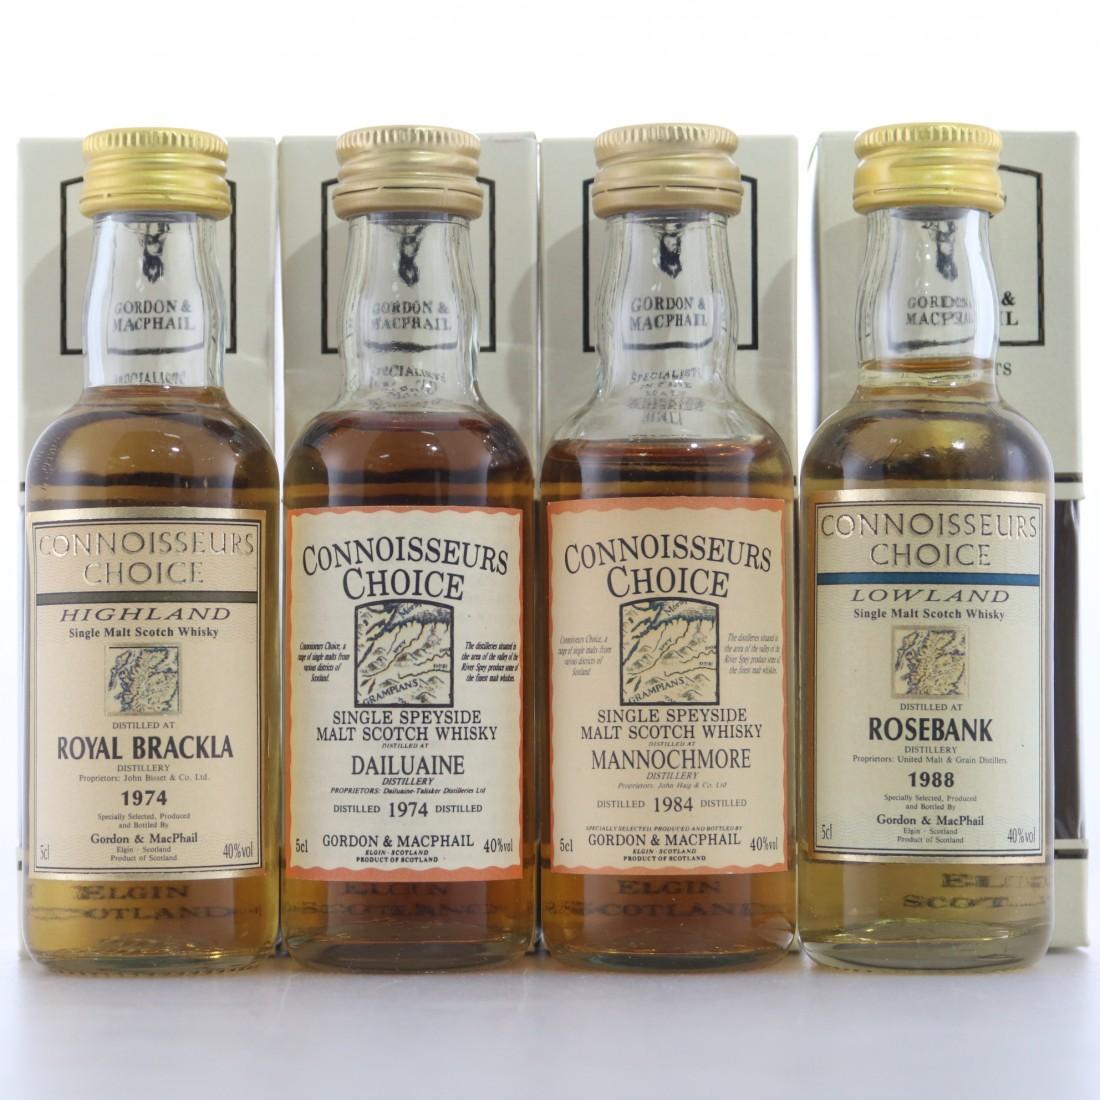 Gordon and MacPhail Miniature Selection x 4 / Includes Rosebank 1988